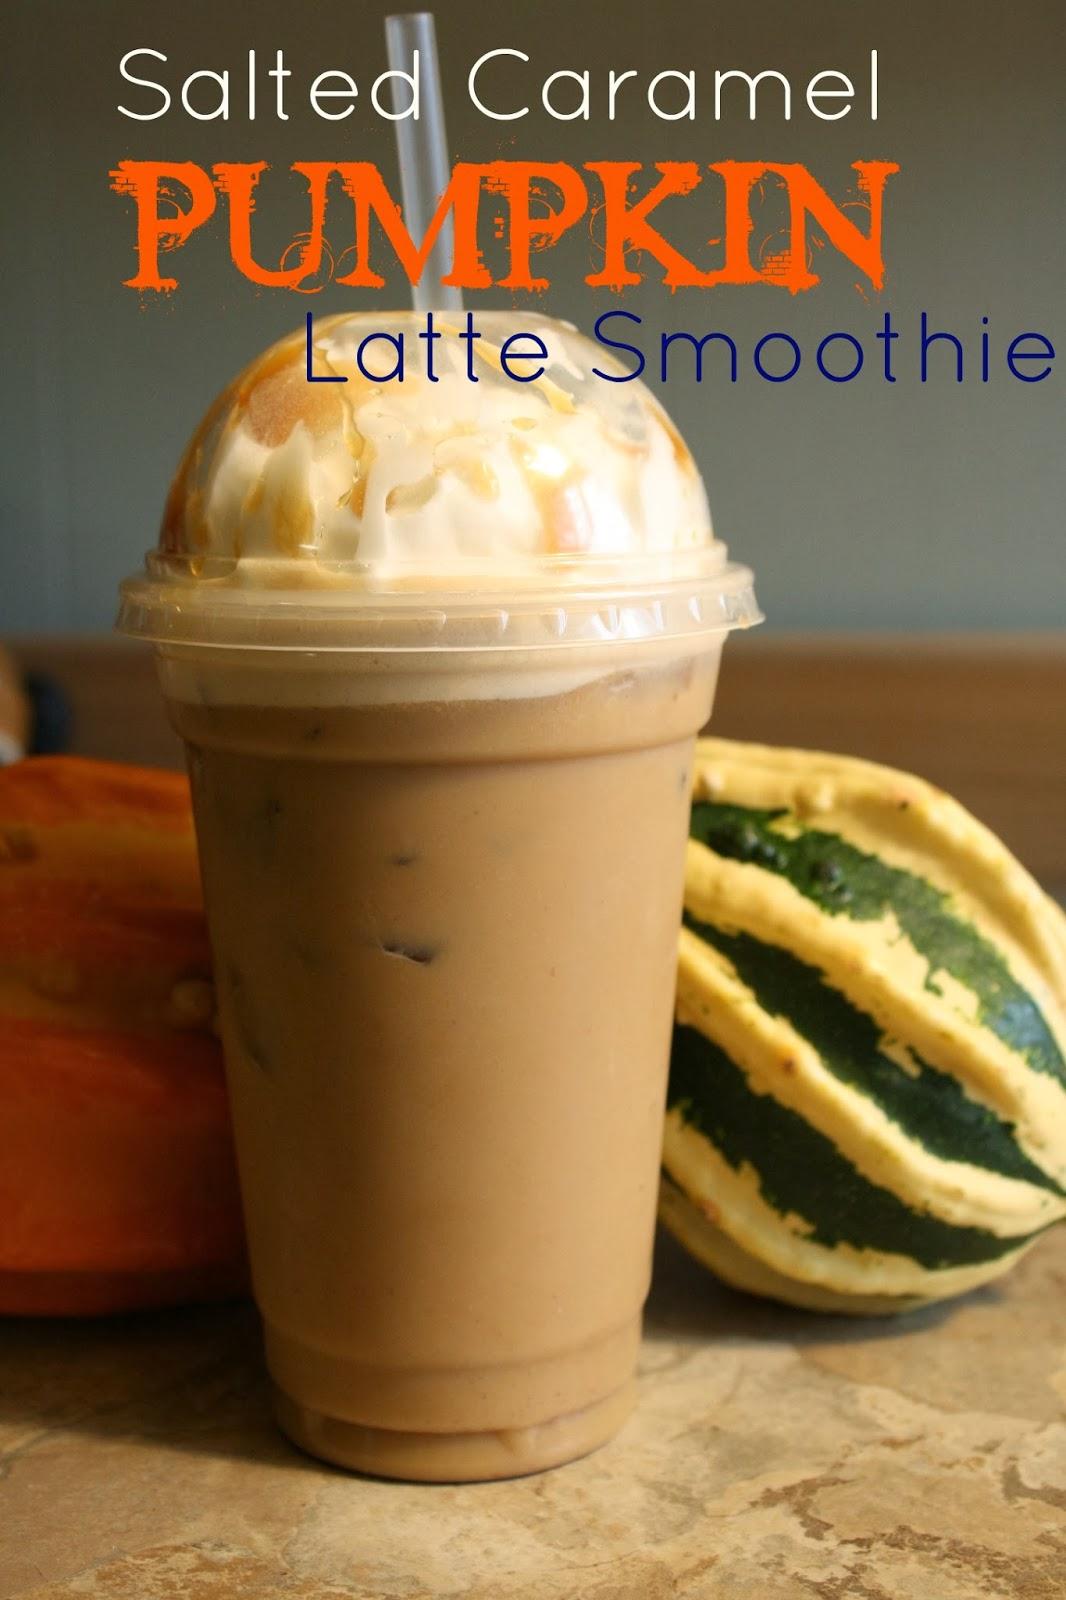 Sara's Home Life: Salted Caramel Pumpkin Latte Smoothie